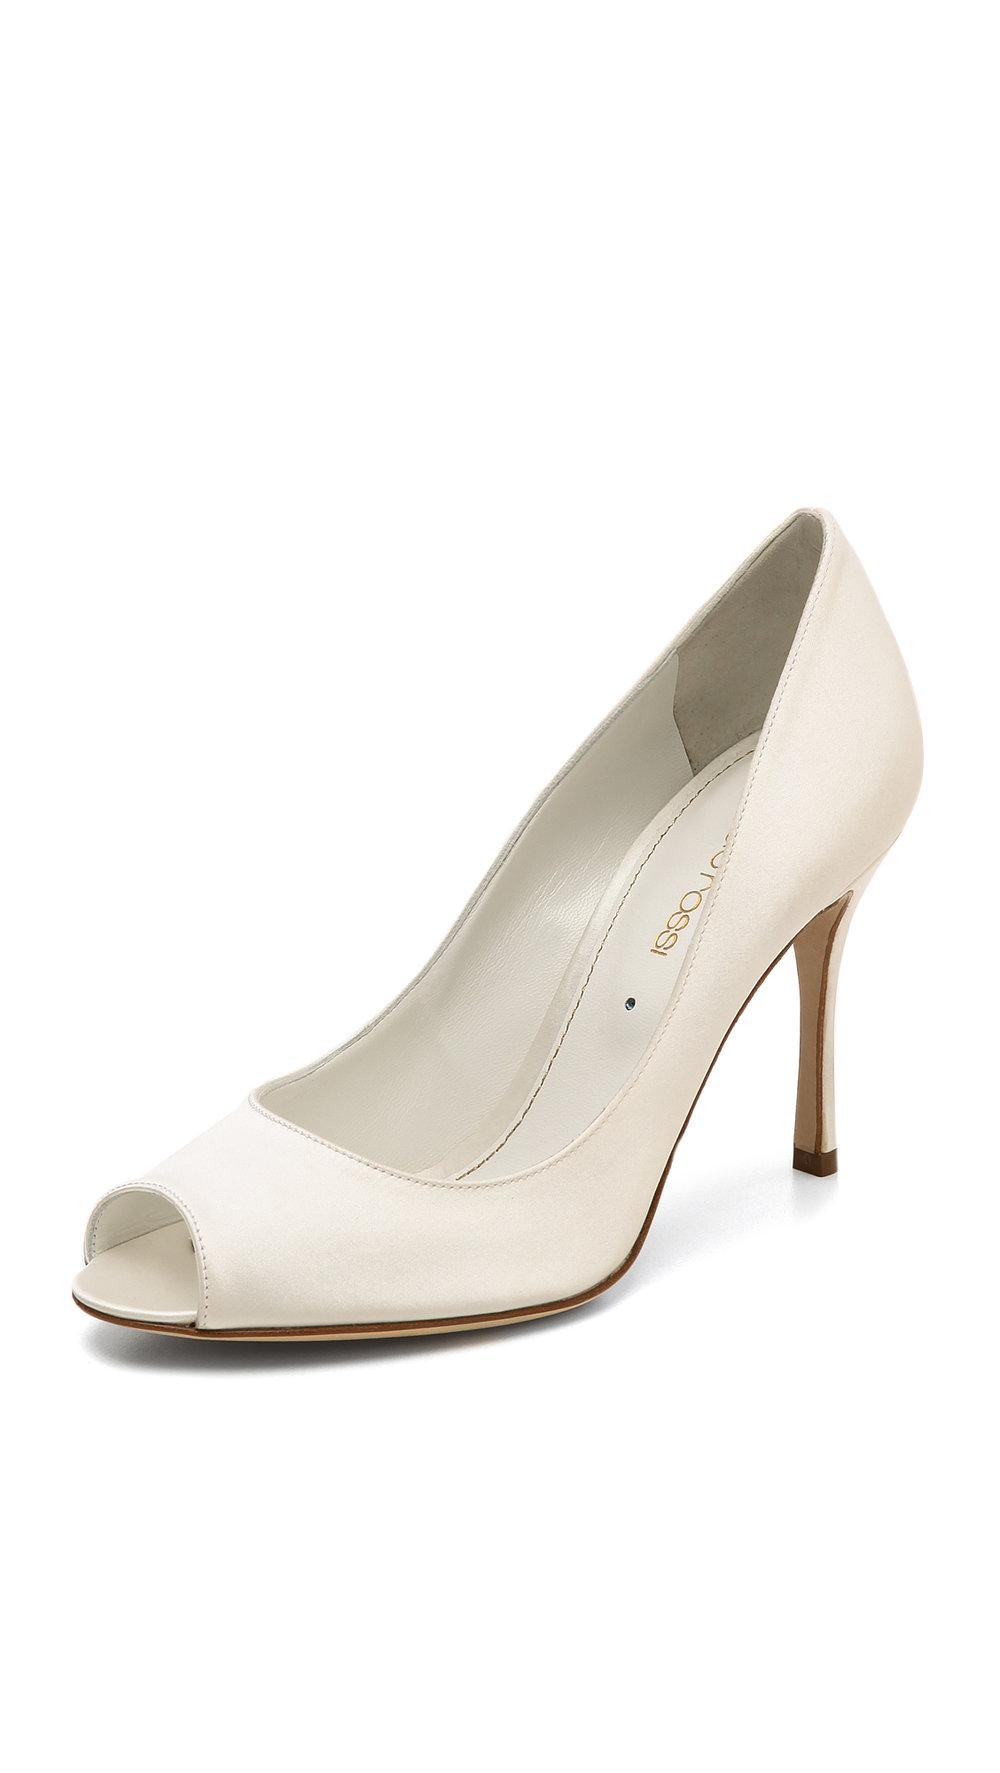 sergio-rossi-white-godiva-peeptoe-pump-white-product-1-22632863-0-789971894-normal.jpeg